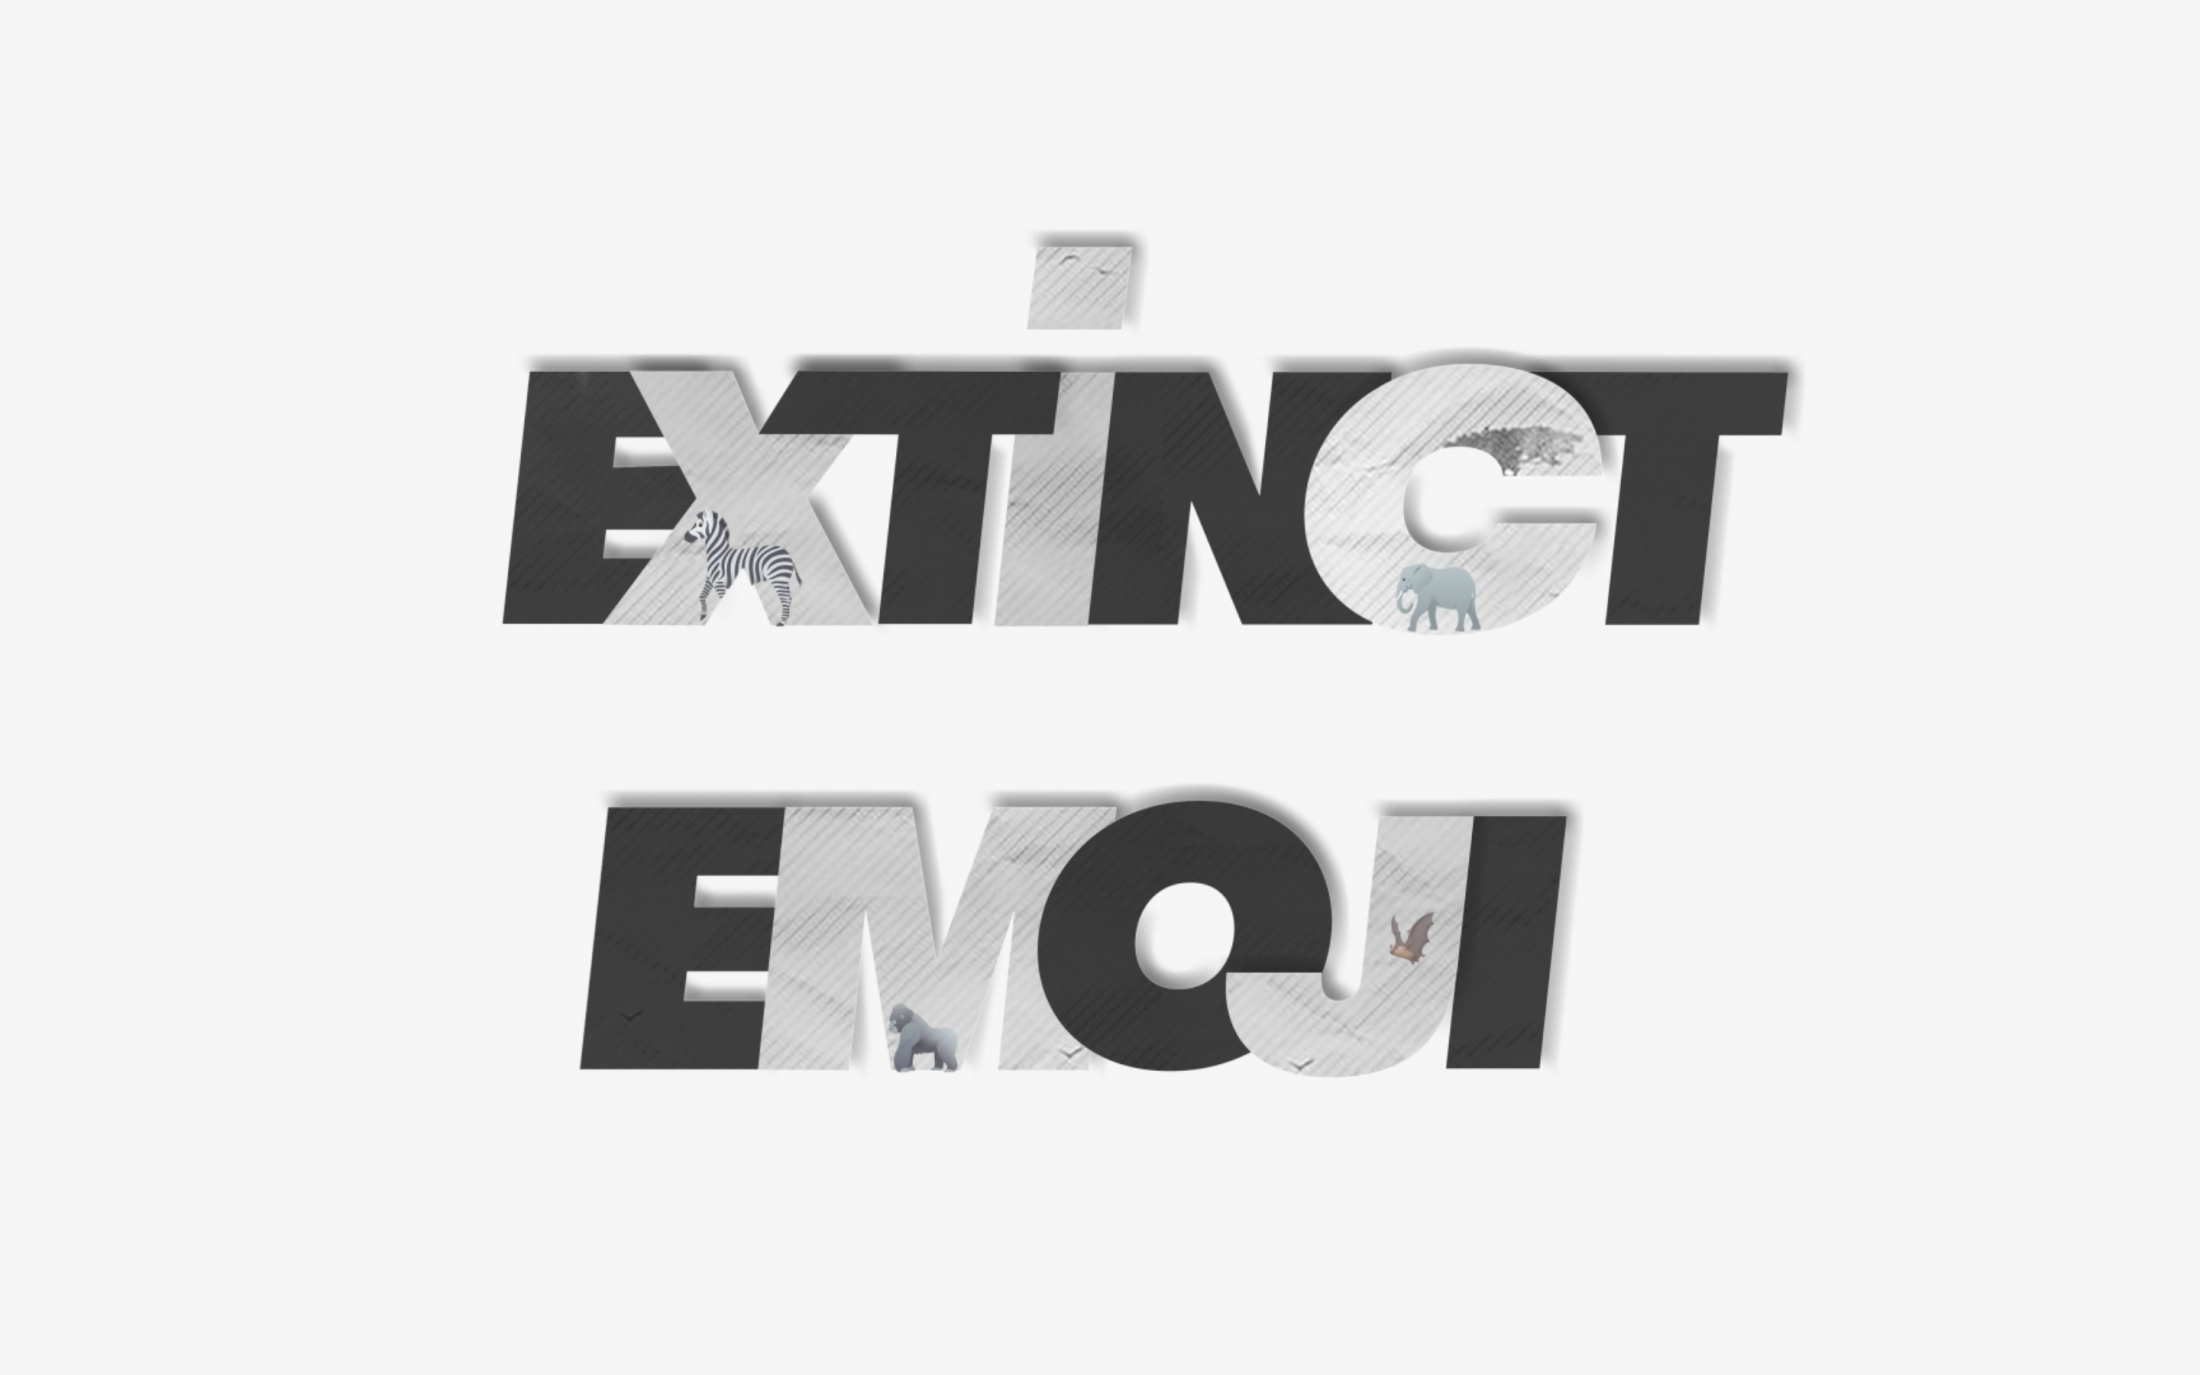 Thumbnail for Extinct Emojis